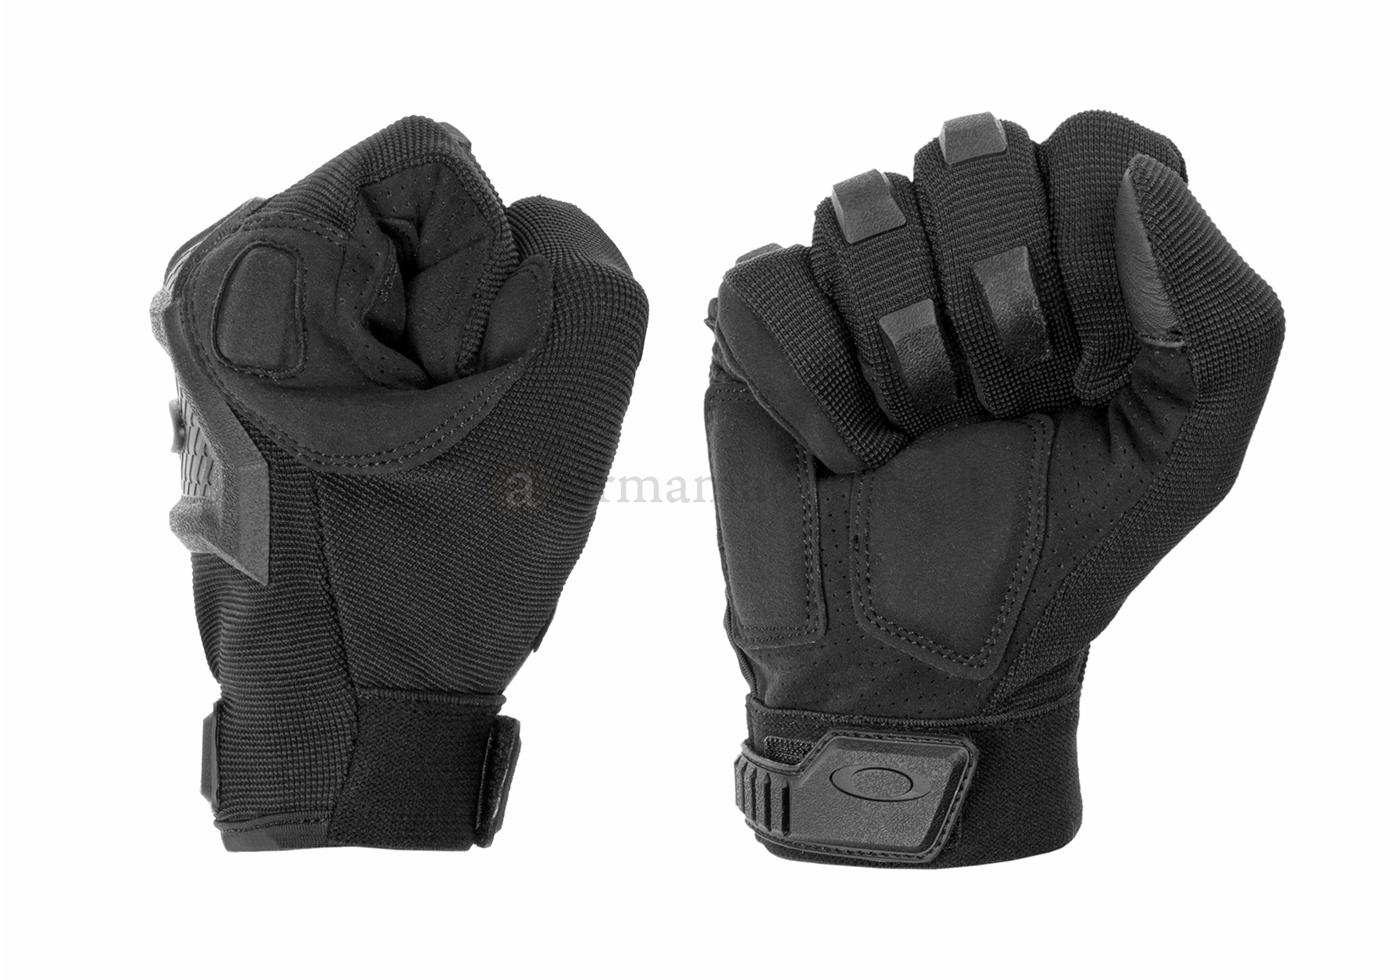 2bc4116ca26 SI Flexion Gloves Black (Oakley) M - Handschuhe - Bekleidung - armamat.at  Onlineshop